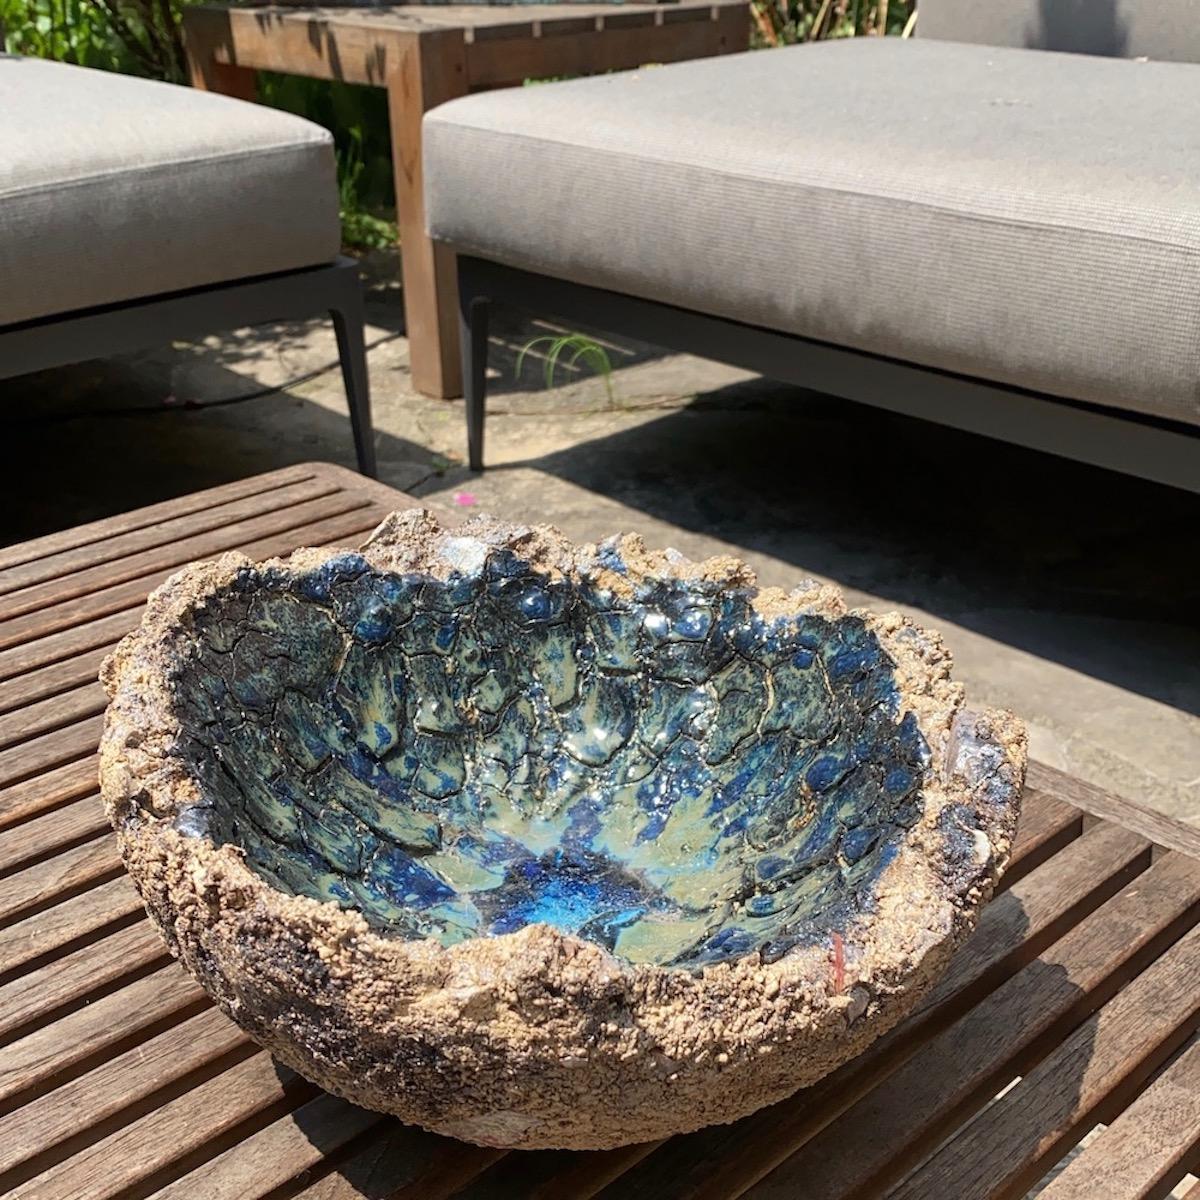 ceramic ornamental bowl on table